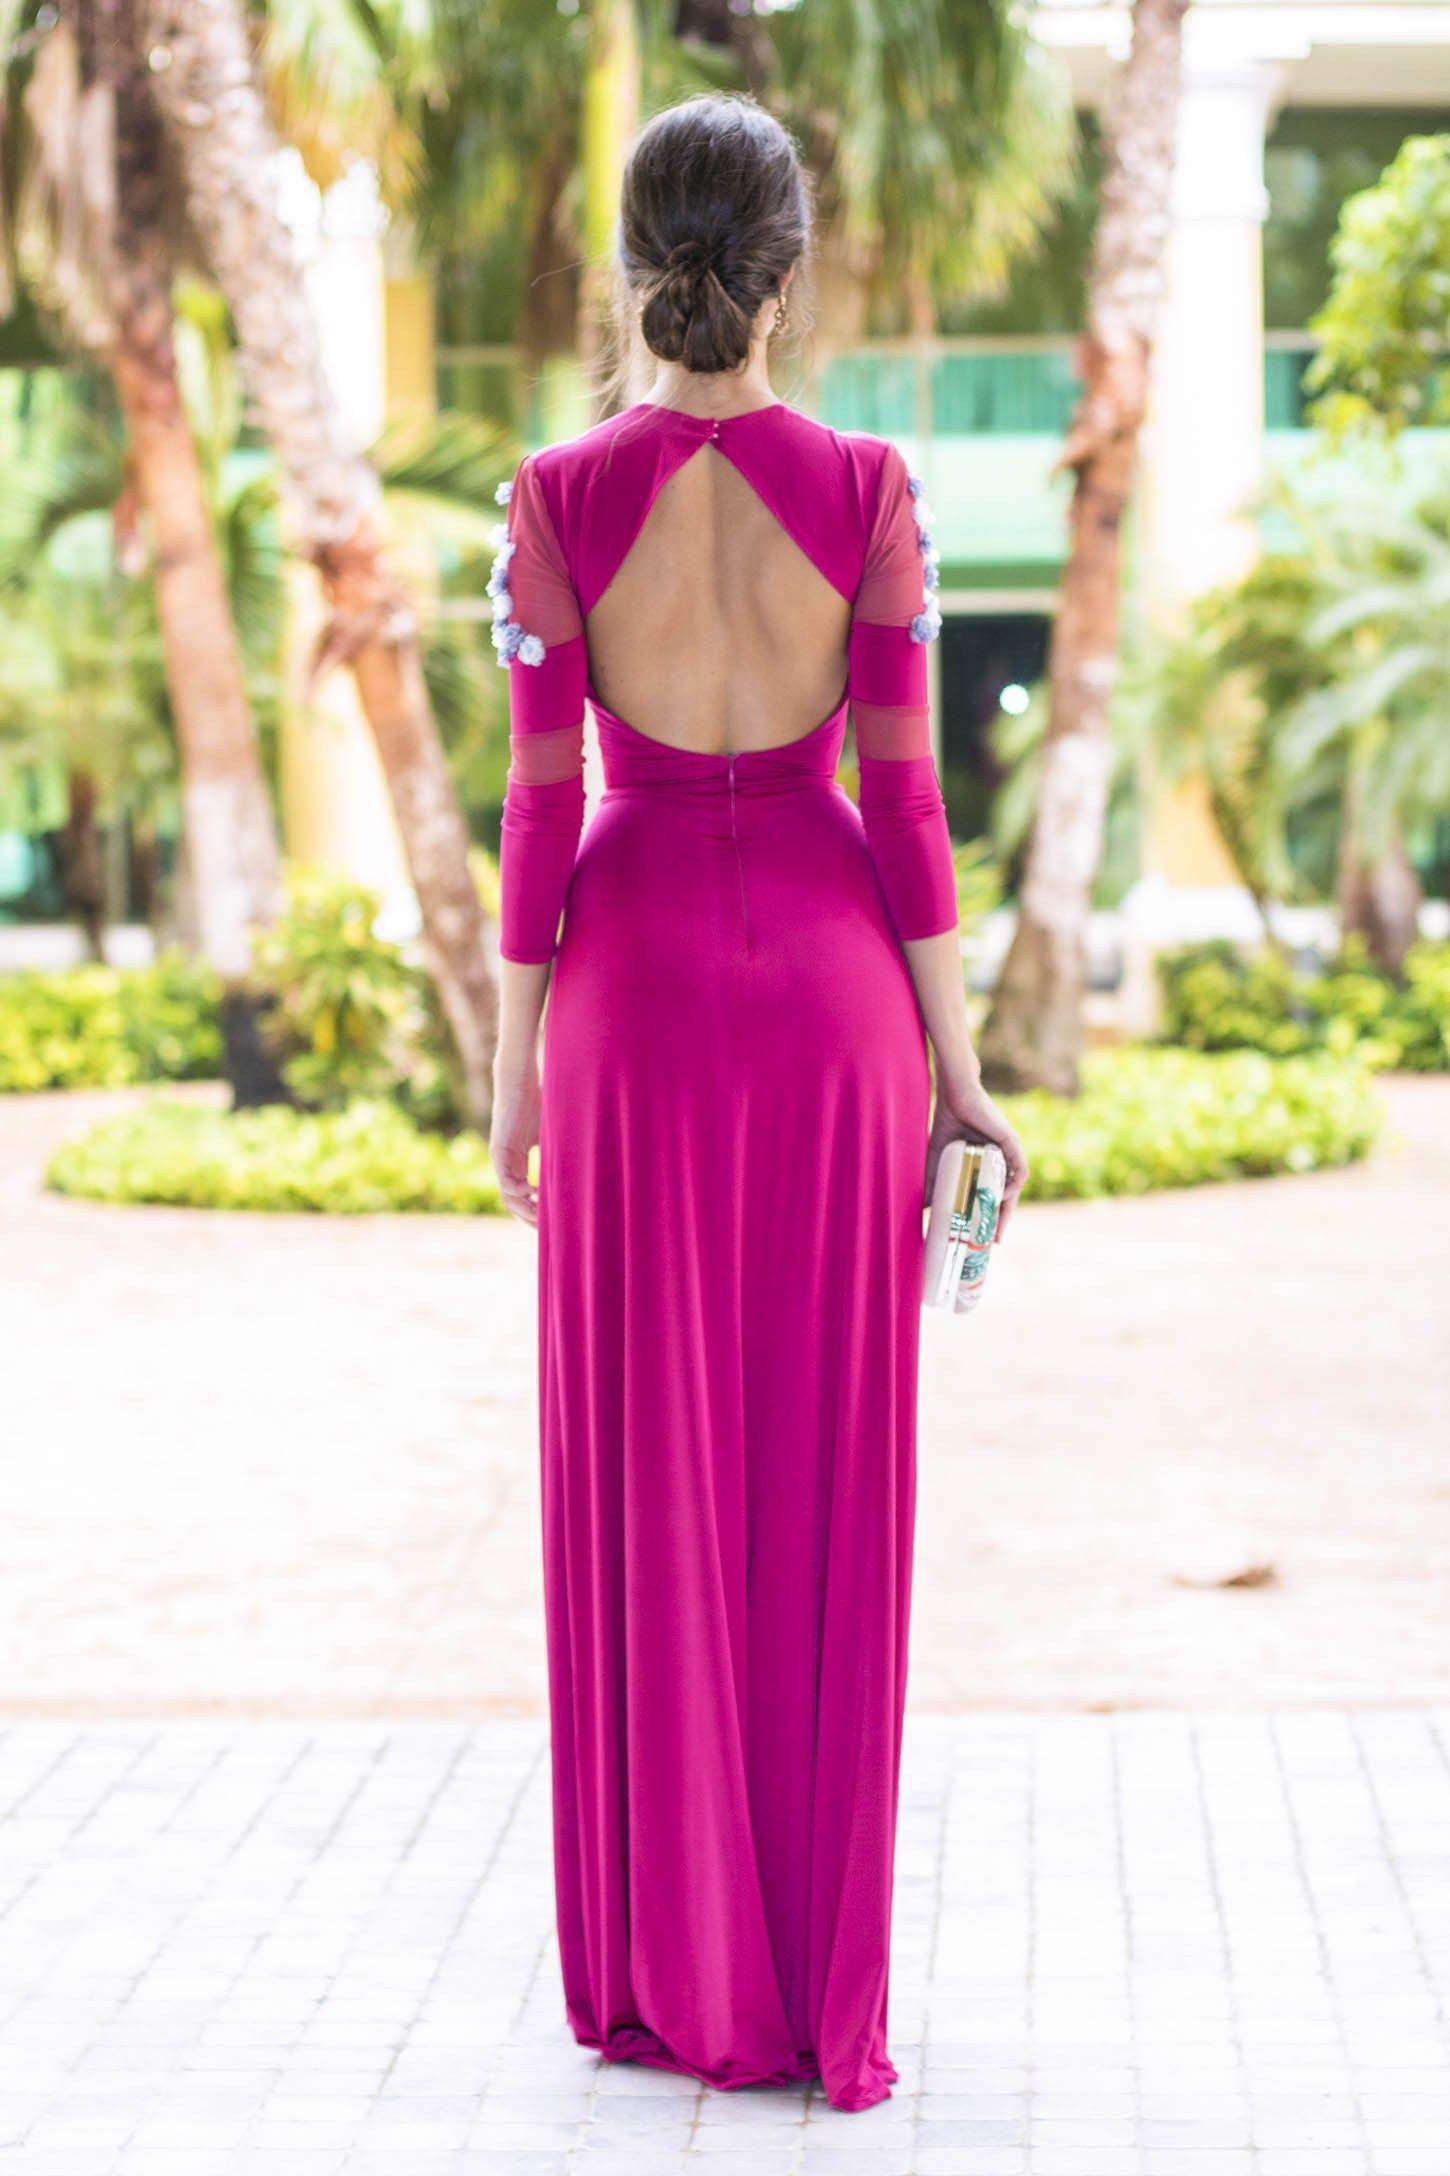 invitada boda fernando claro costura vestido noche | EVENTOS | Pinterest